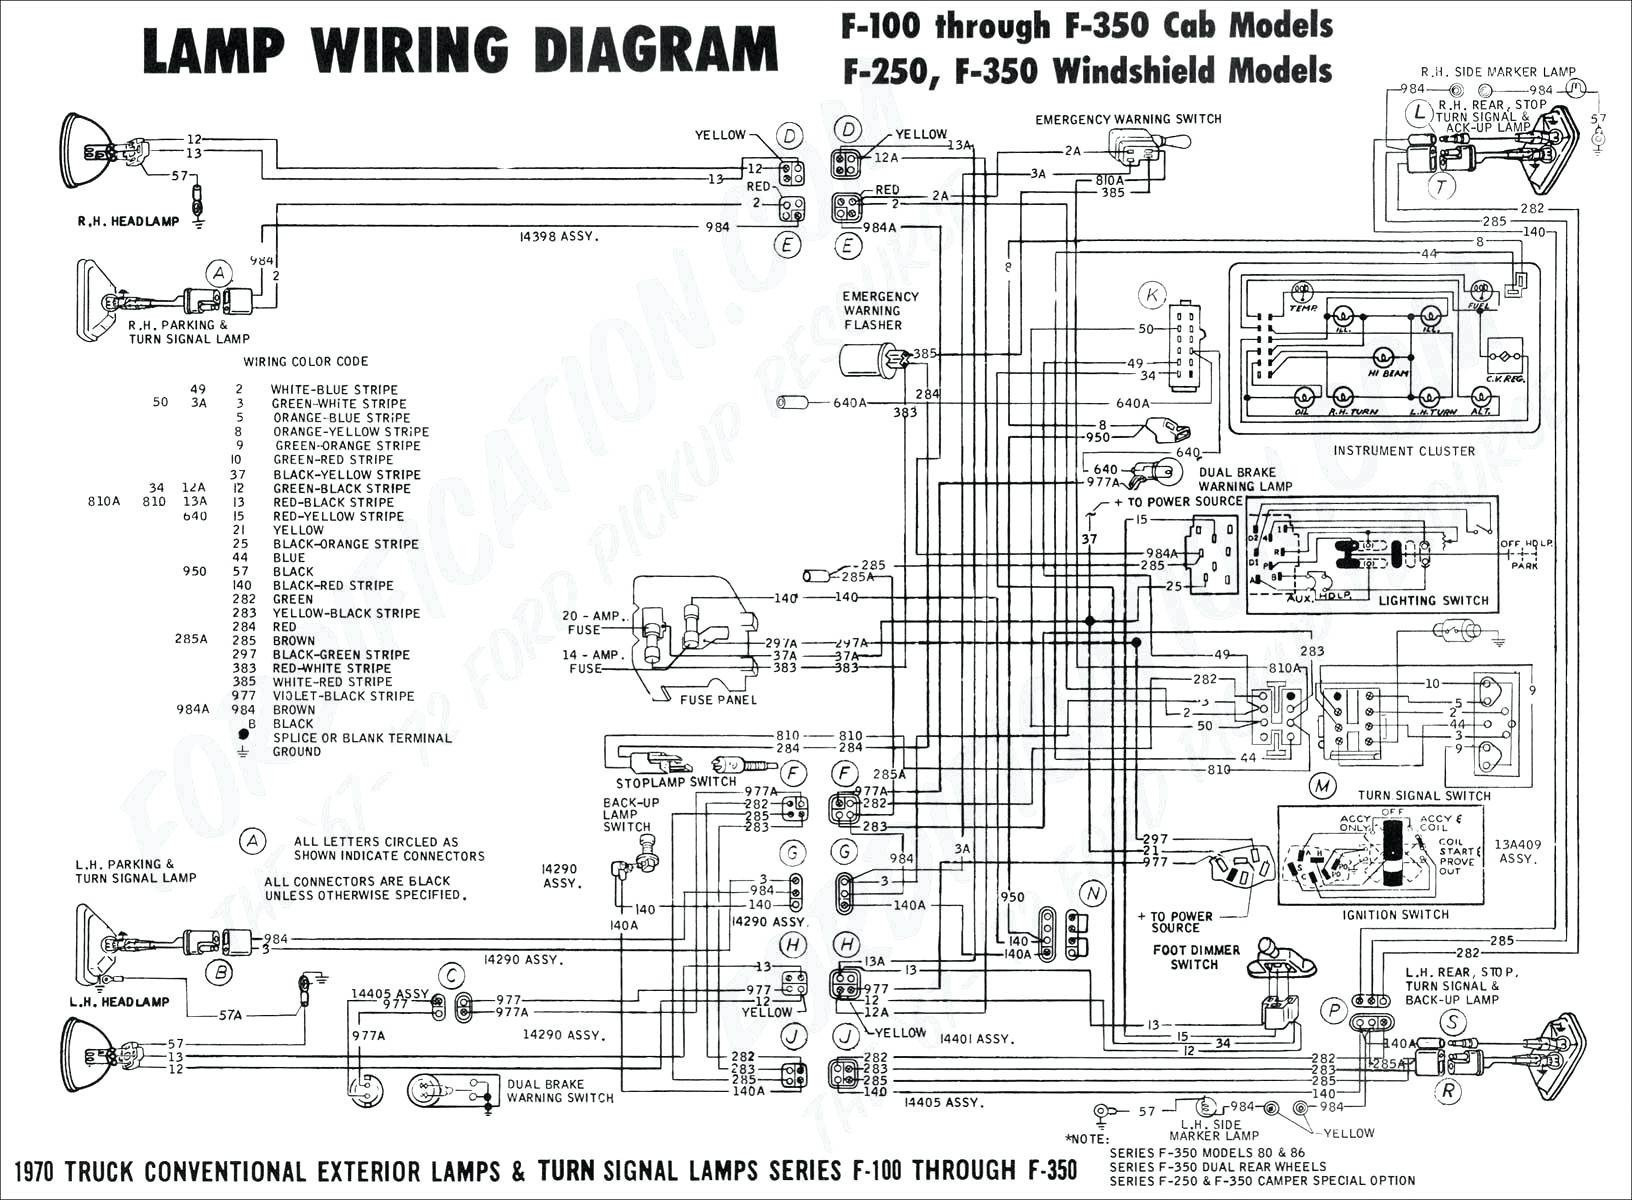 Wiring Diagram For Starter Solenoid - Pickenscountymedicalcenter - Starter Wiring Diagram Ford